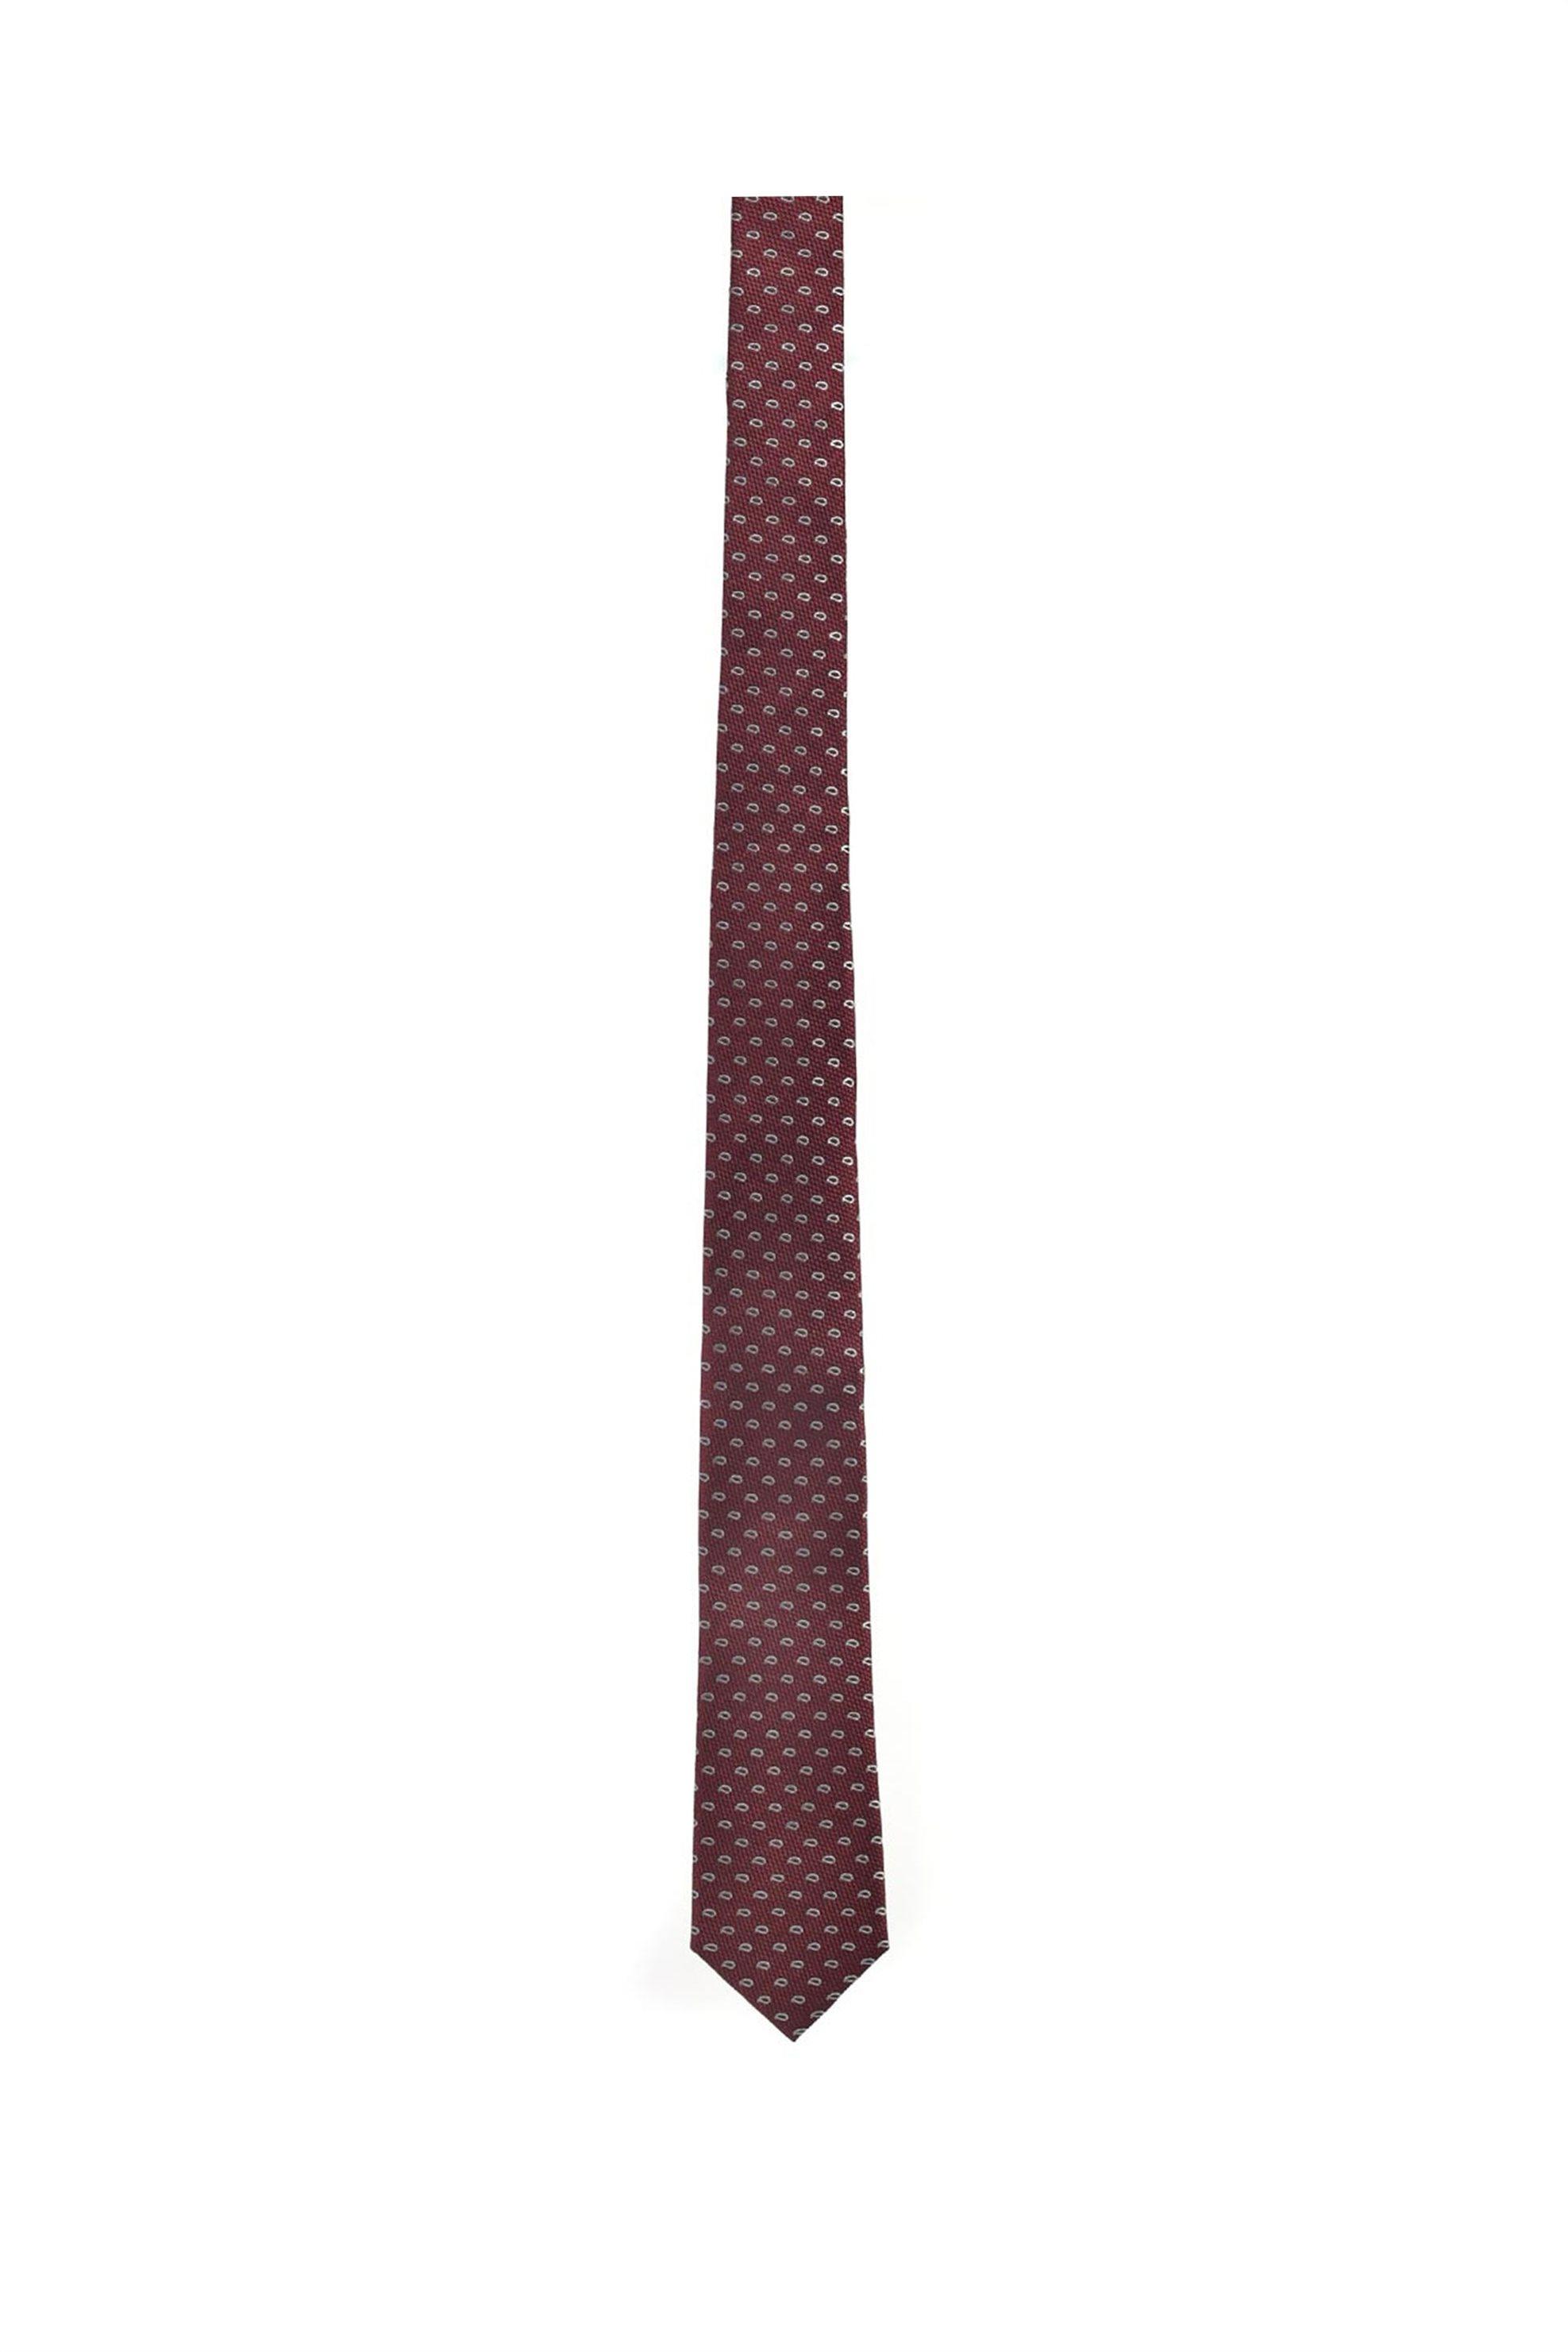 Vardas ανδρική μεταξωτή γραβάτα ''Retro Style Twill'' - 2052005364207 - Μπορντό